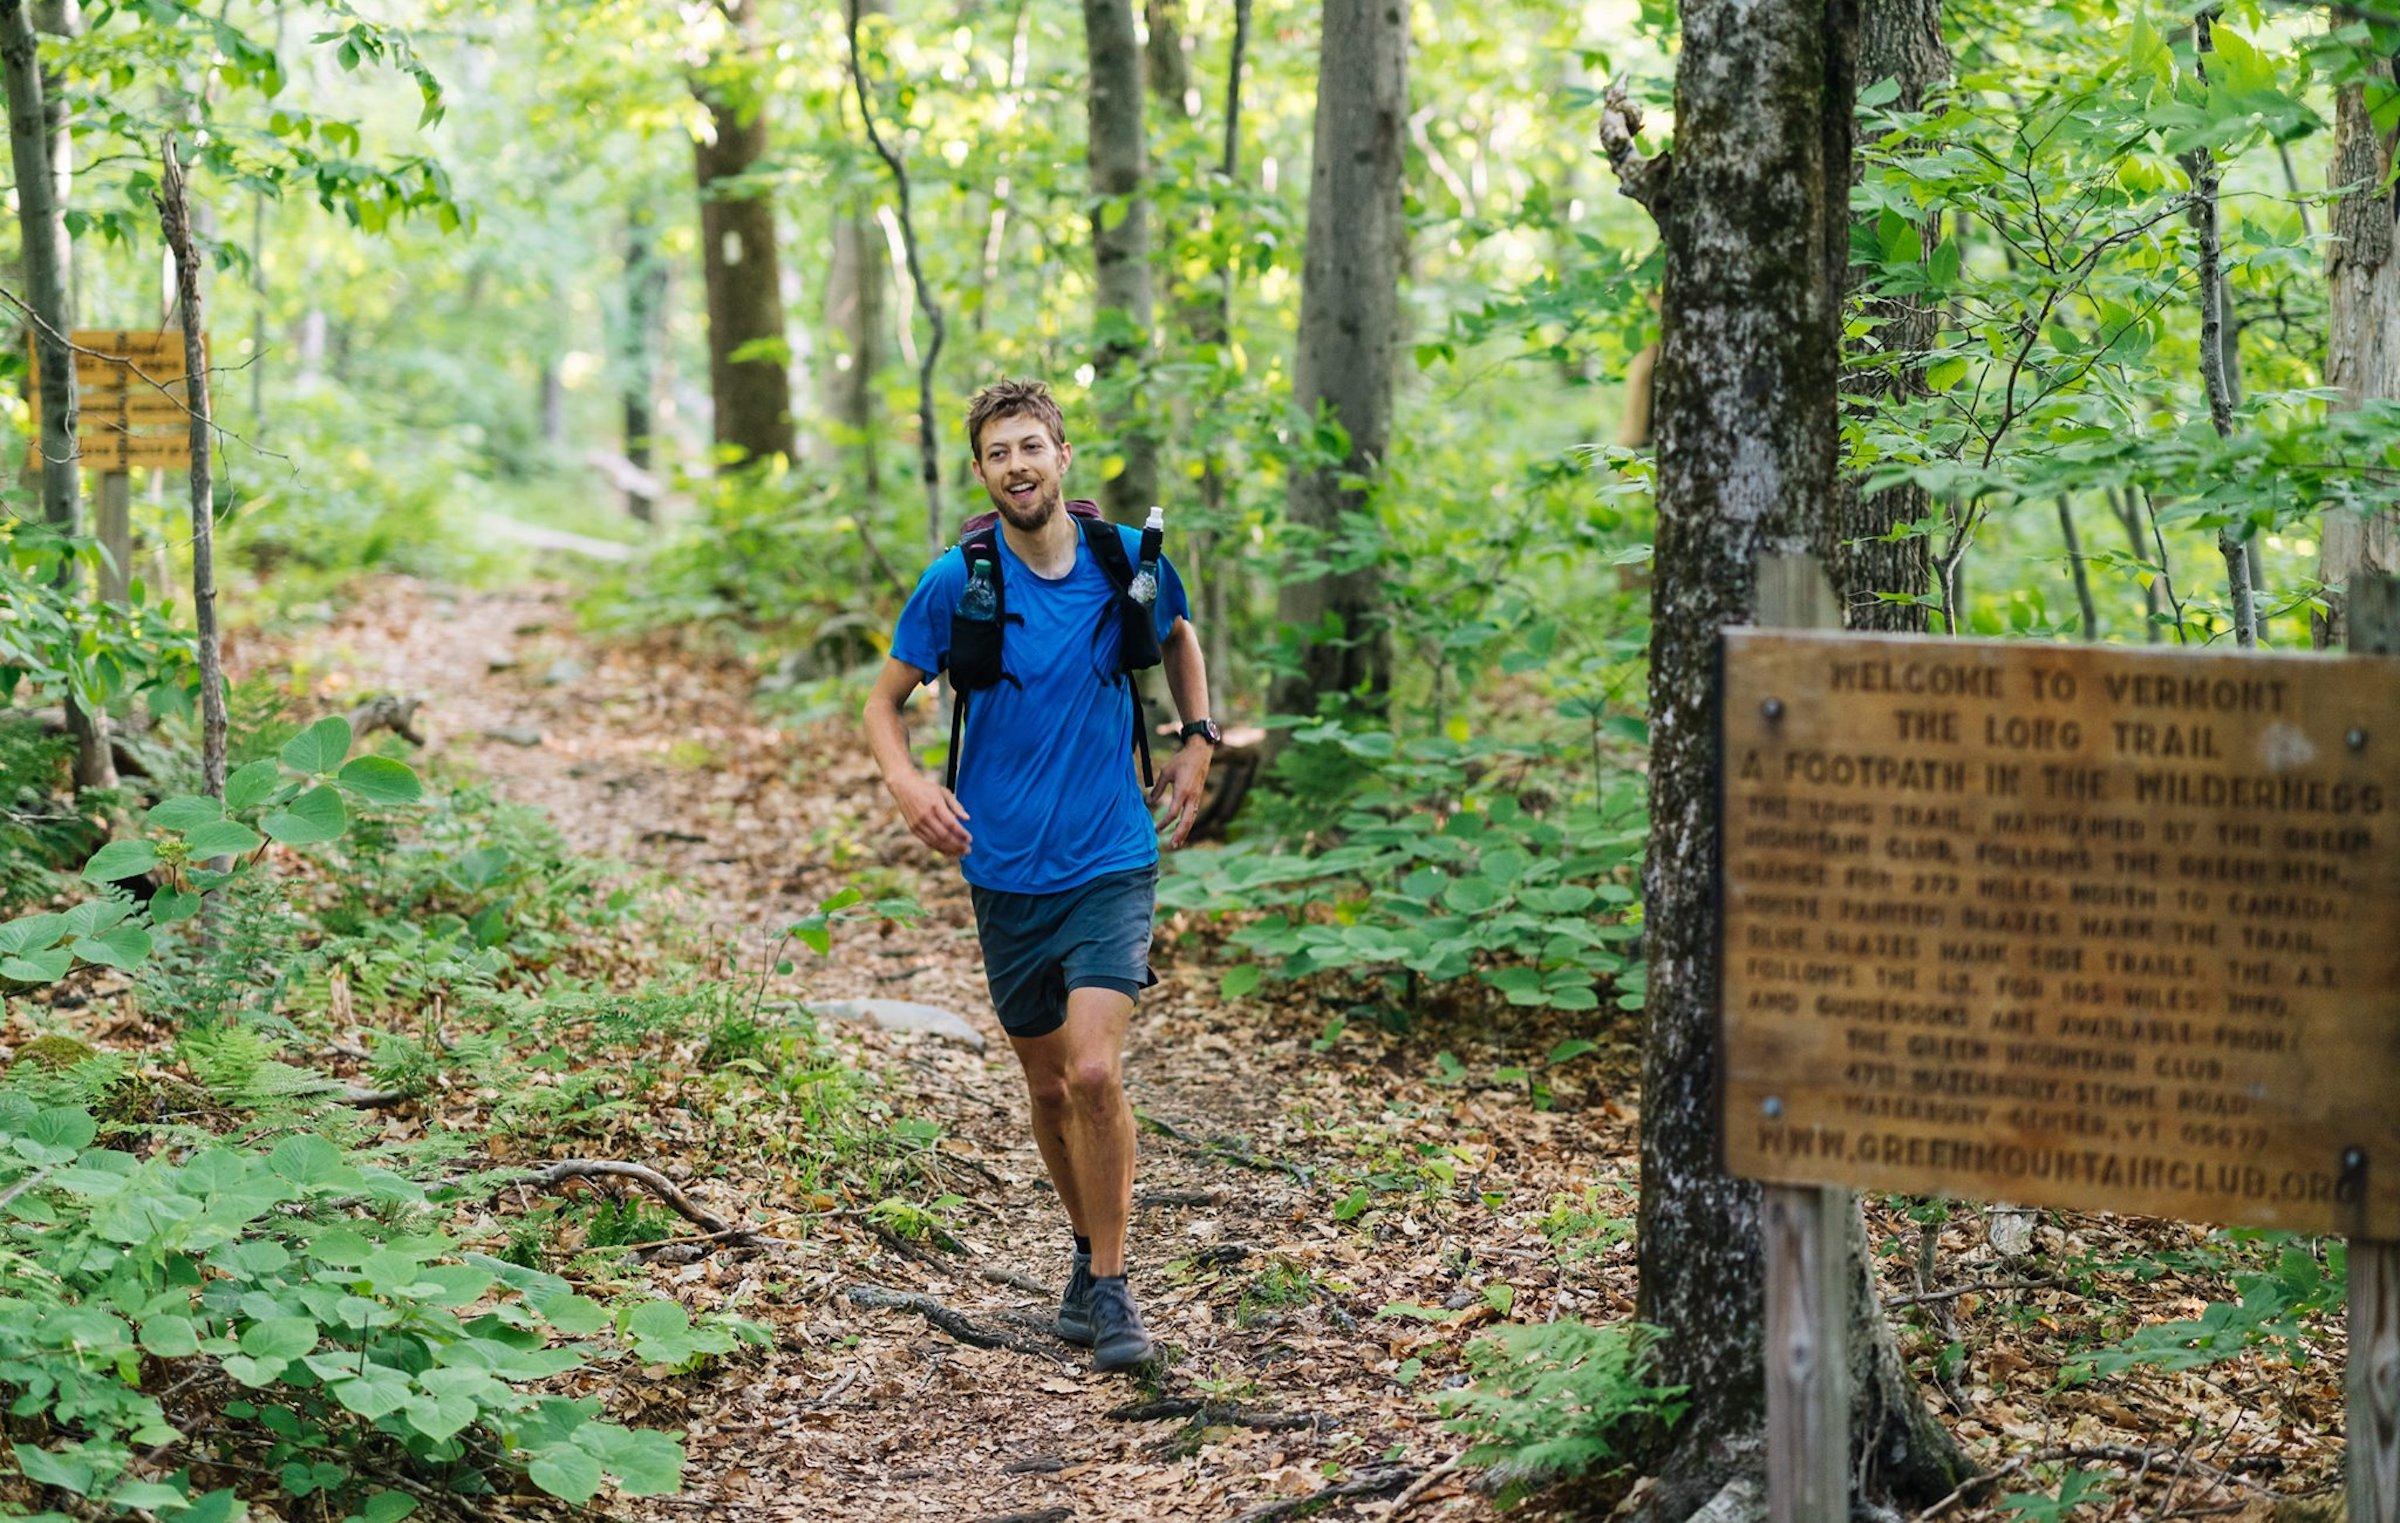 joe stringbean mcconaughy running the Long Trail in vermont